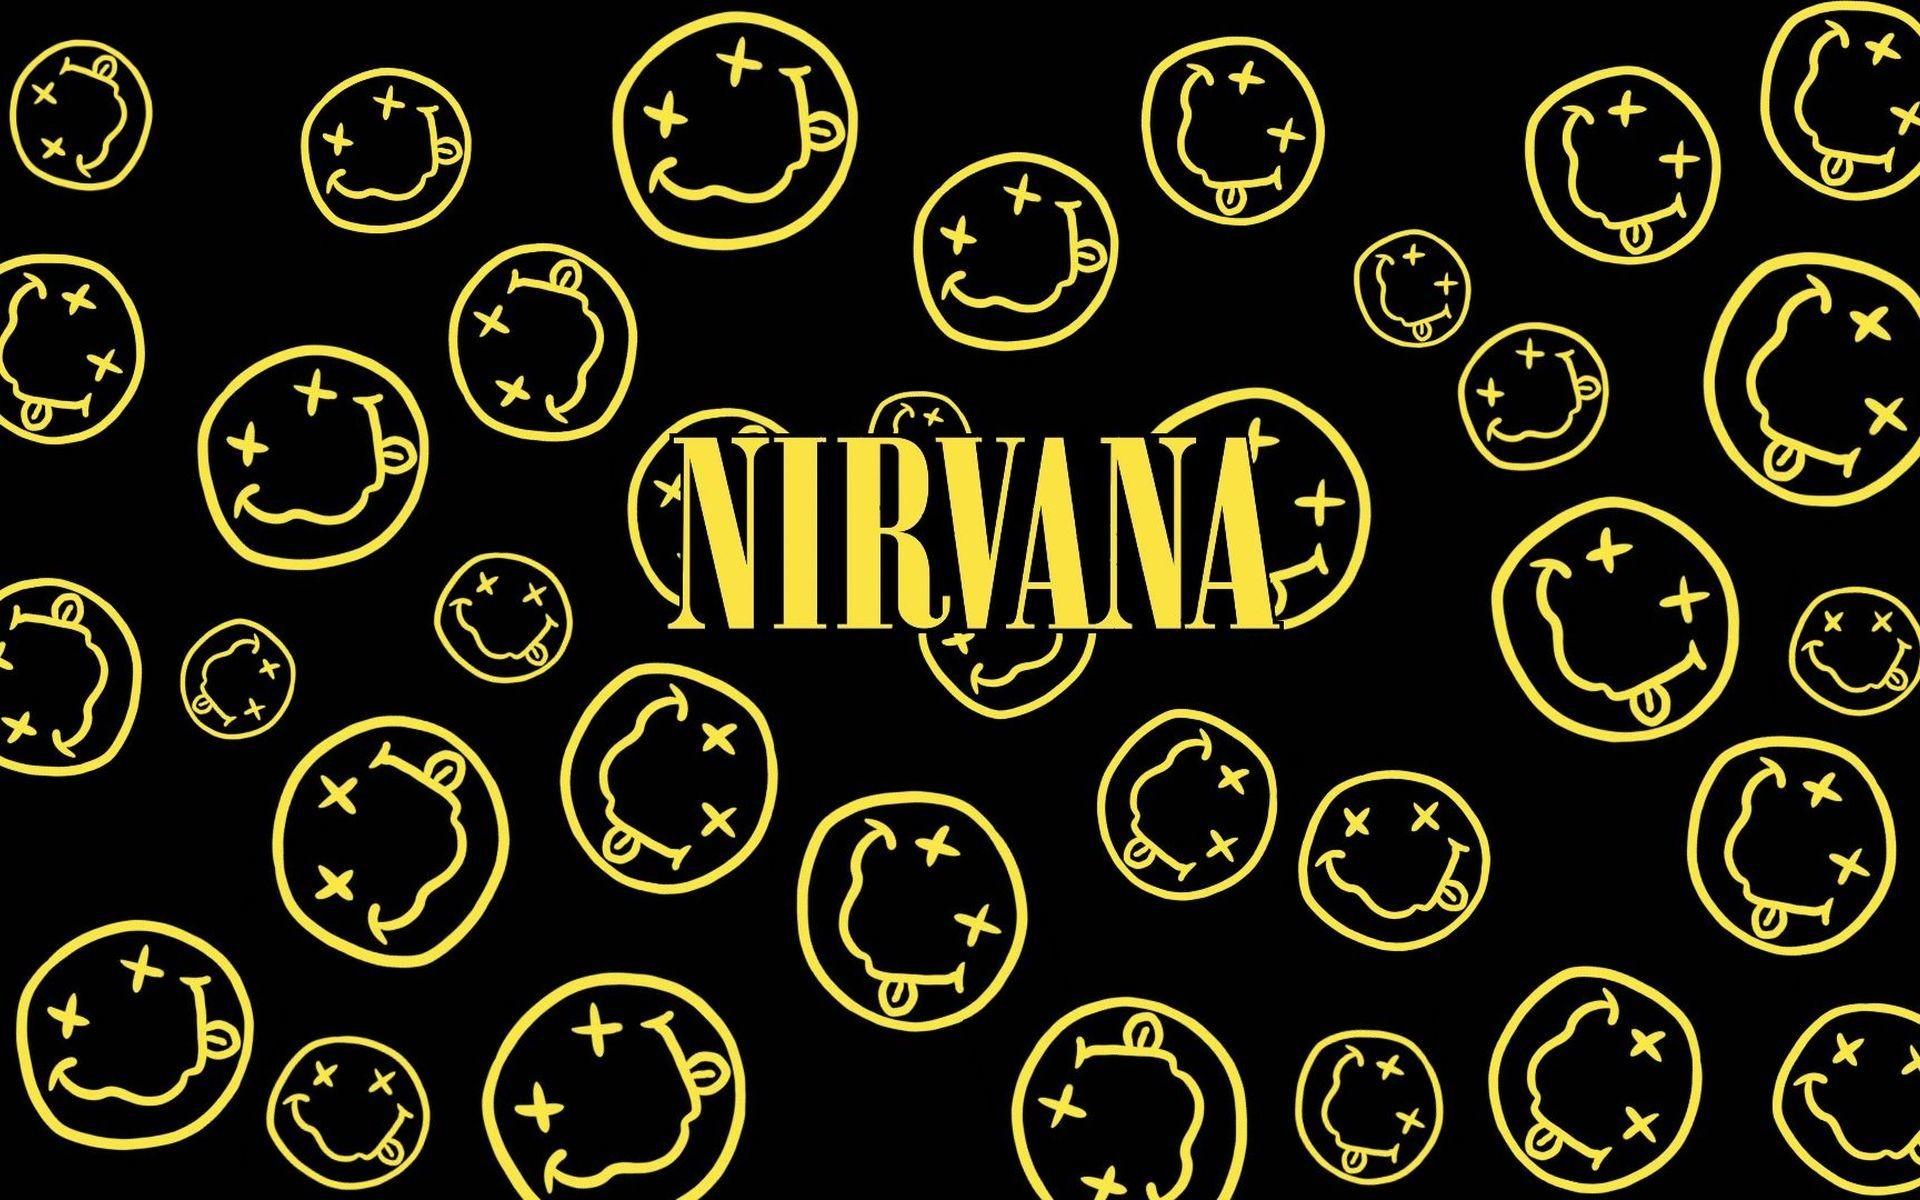 Nirvana Wallpaper 1080p 1920x1200